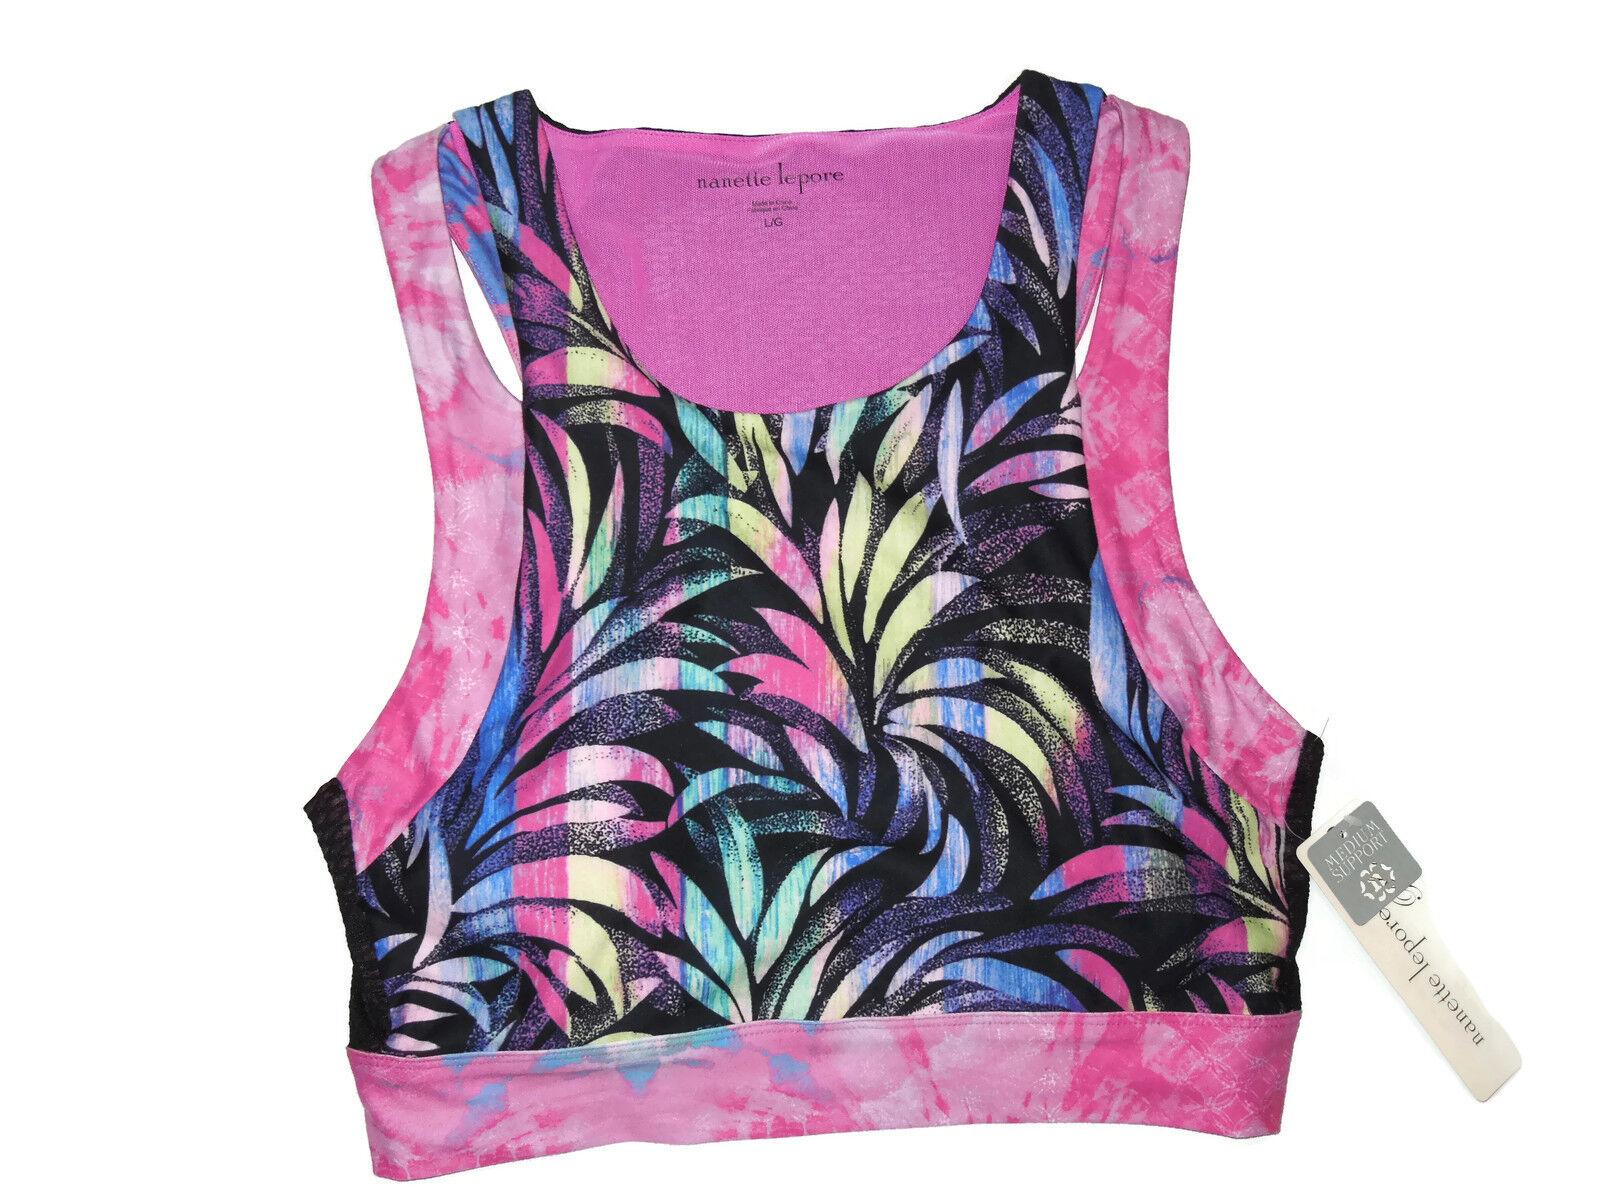 Nanette Lepore tropical print corset Crop Top size MEDIUM retail  58